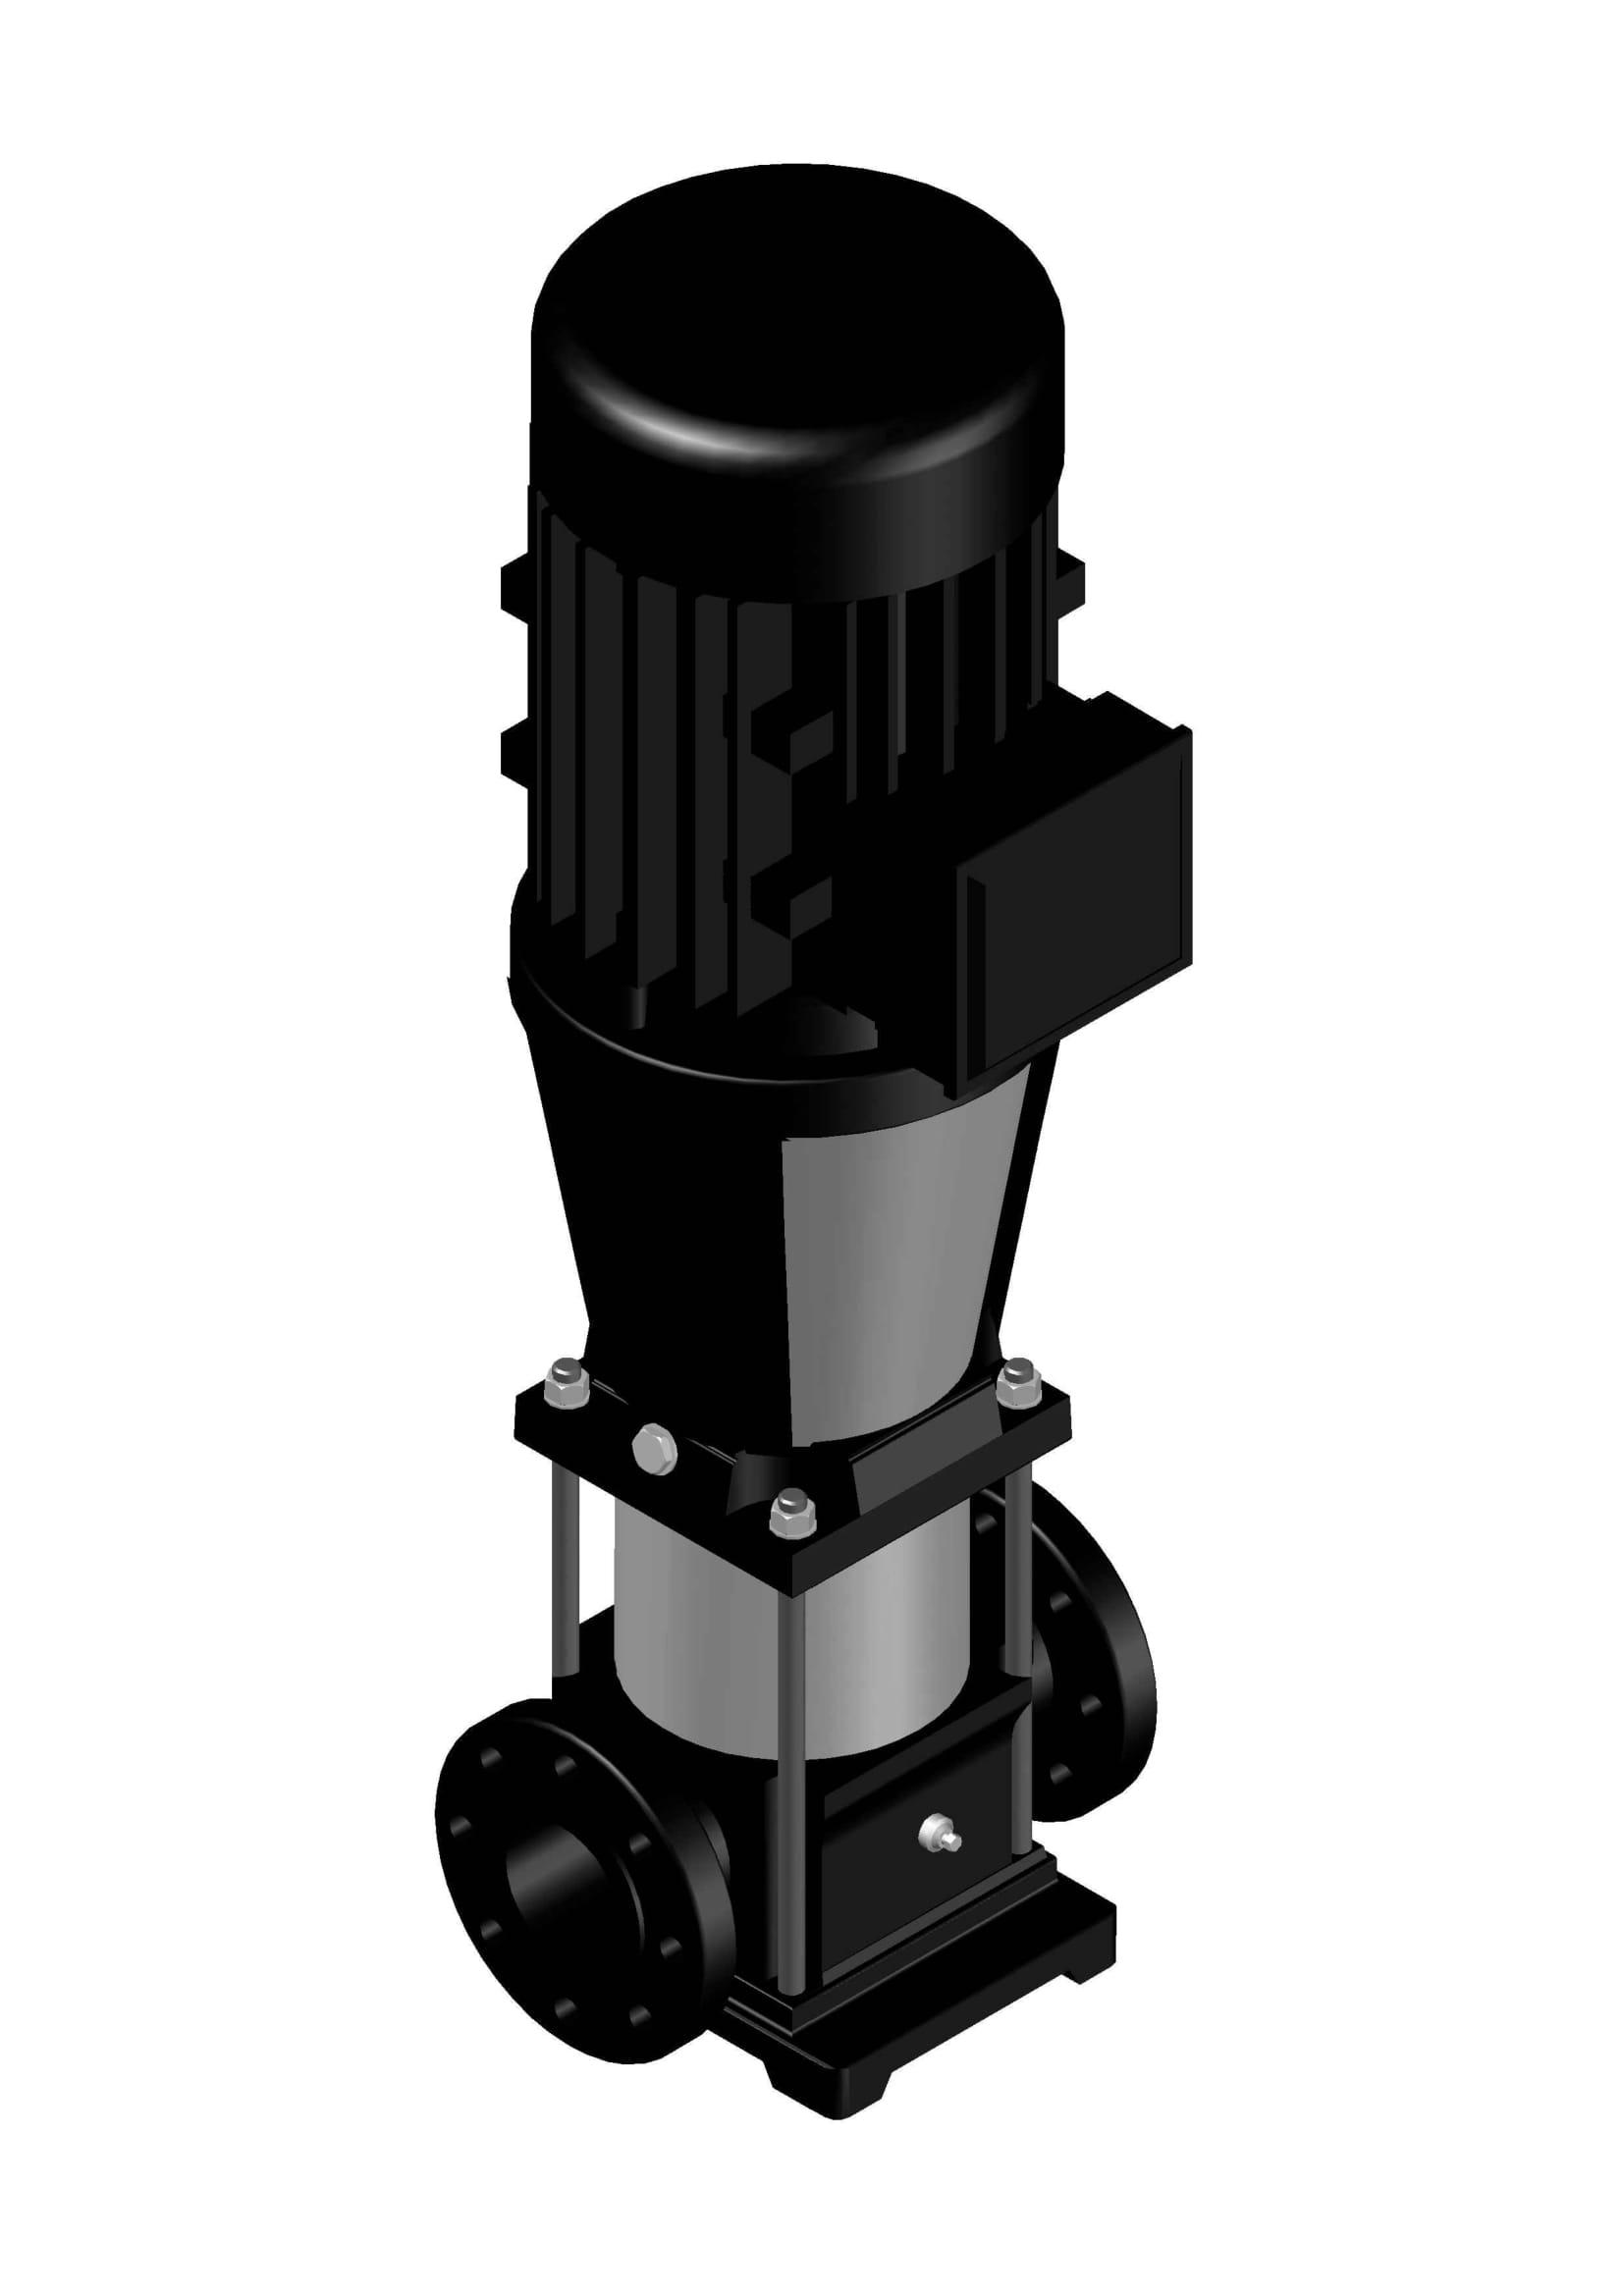 BV 64-02